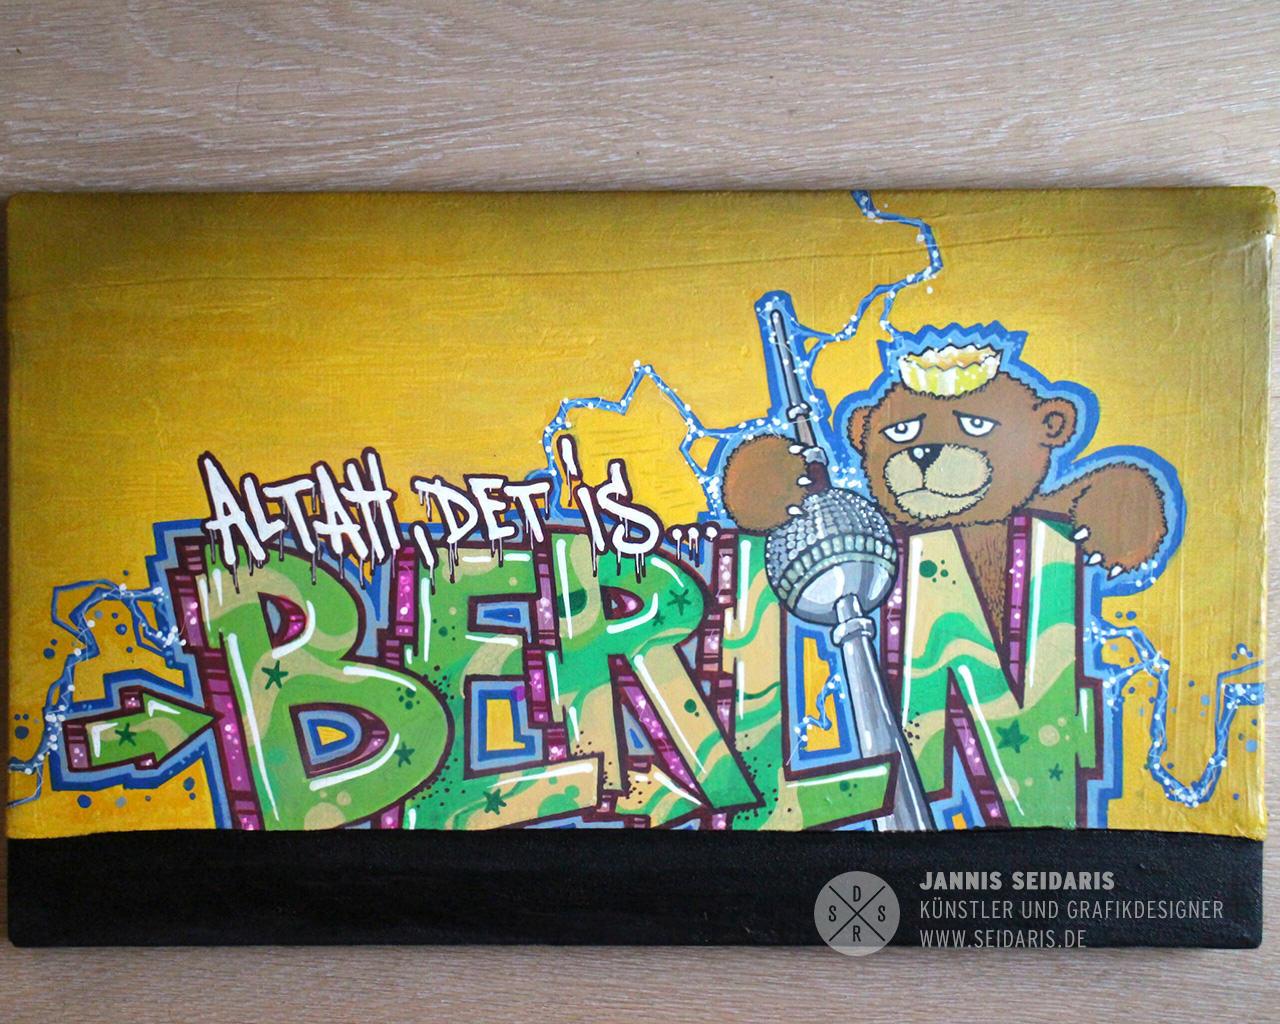 Graffiti pixacao fotografie street art typographie